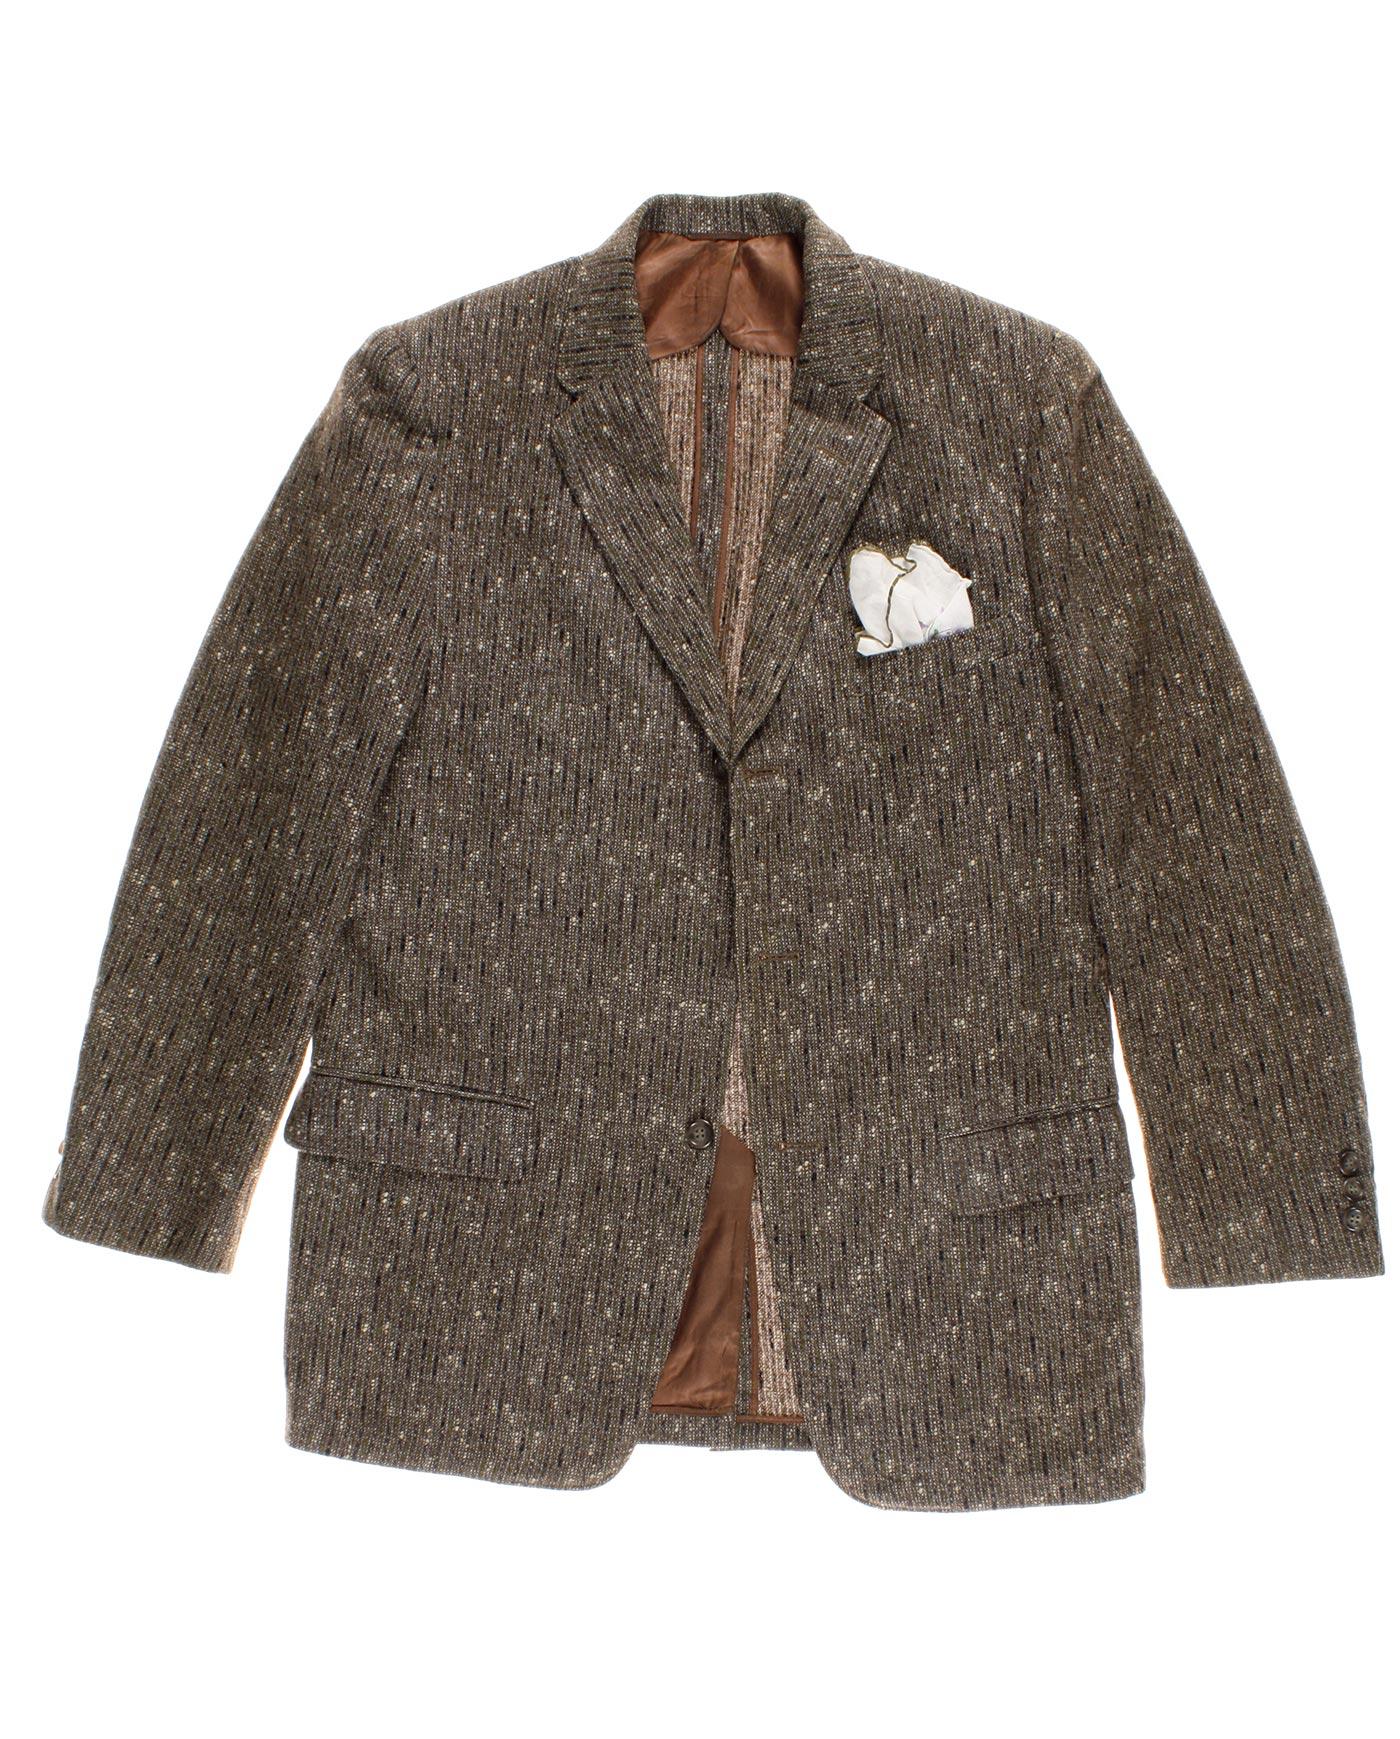 bond clothes wool jacket 50s madeinused